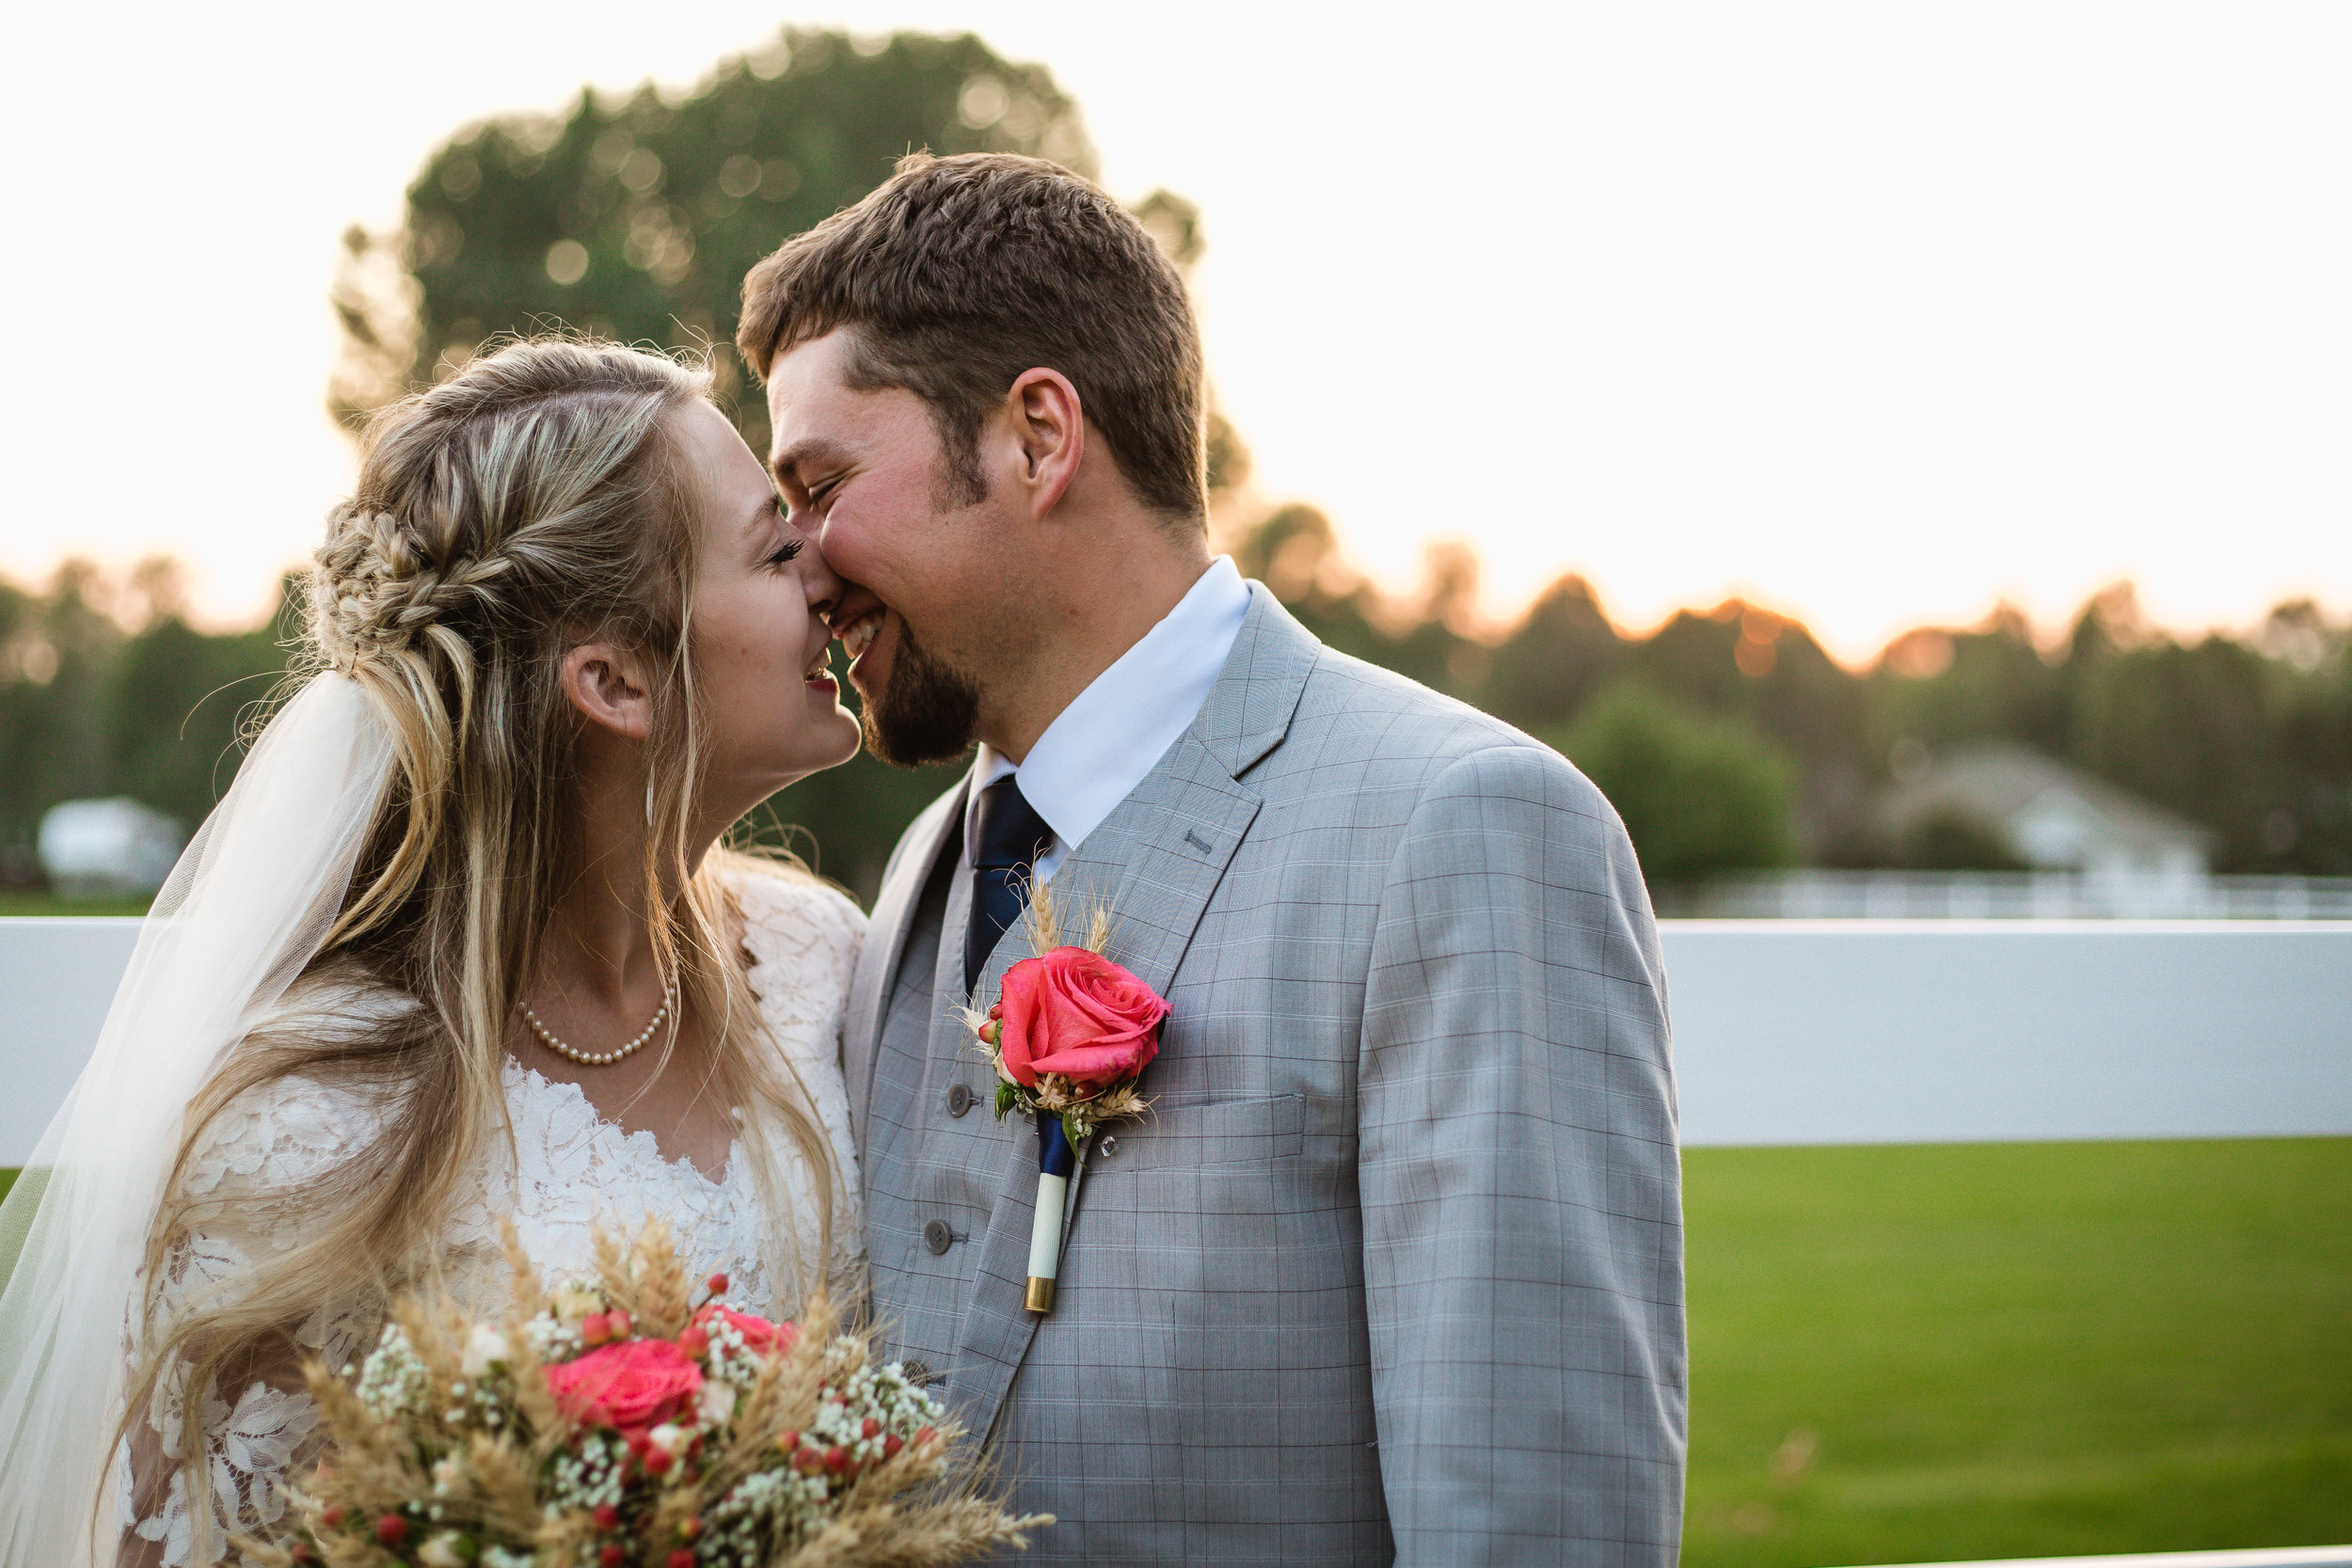 Courtney Volksen Photography   Idaho Falls bridal & wedding photographer at a  country wedding